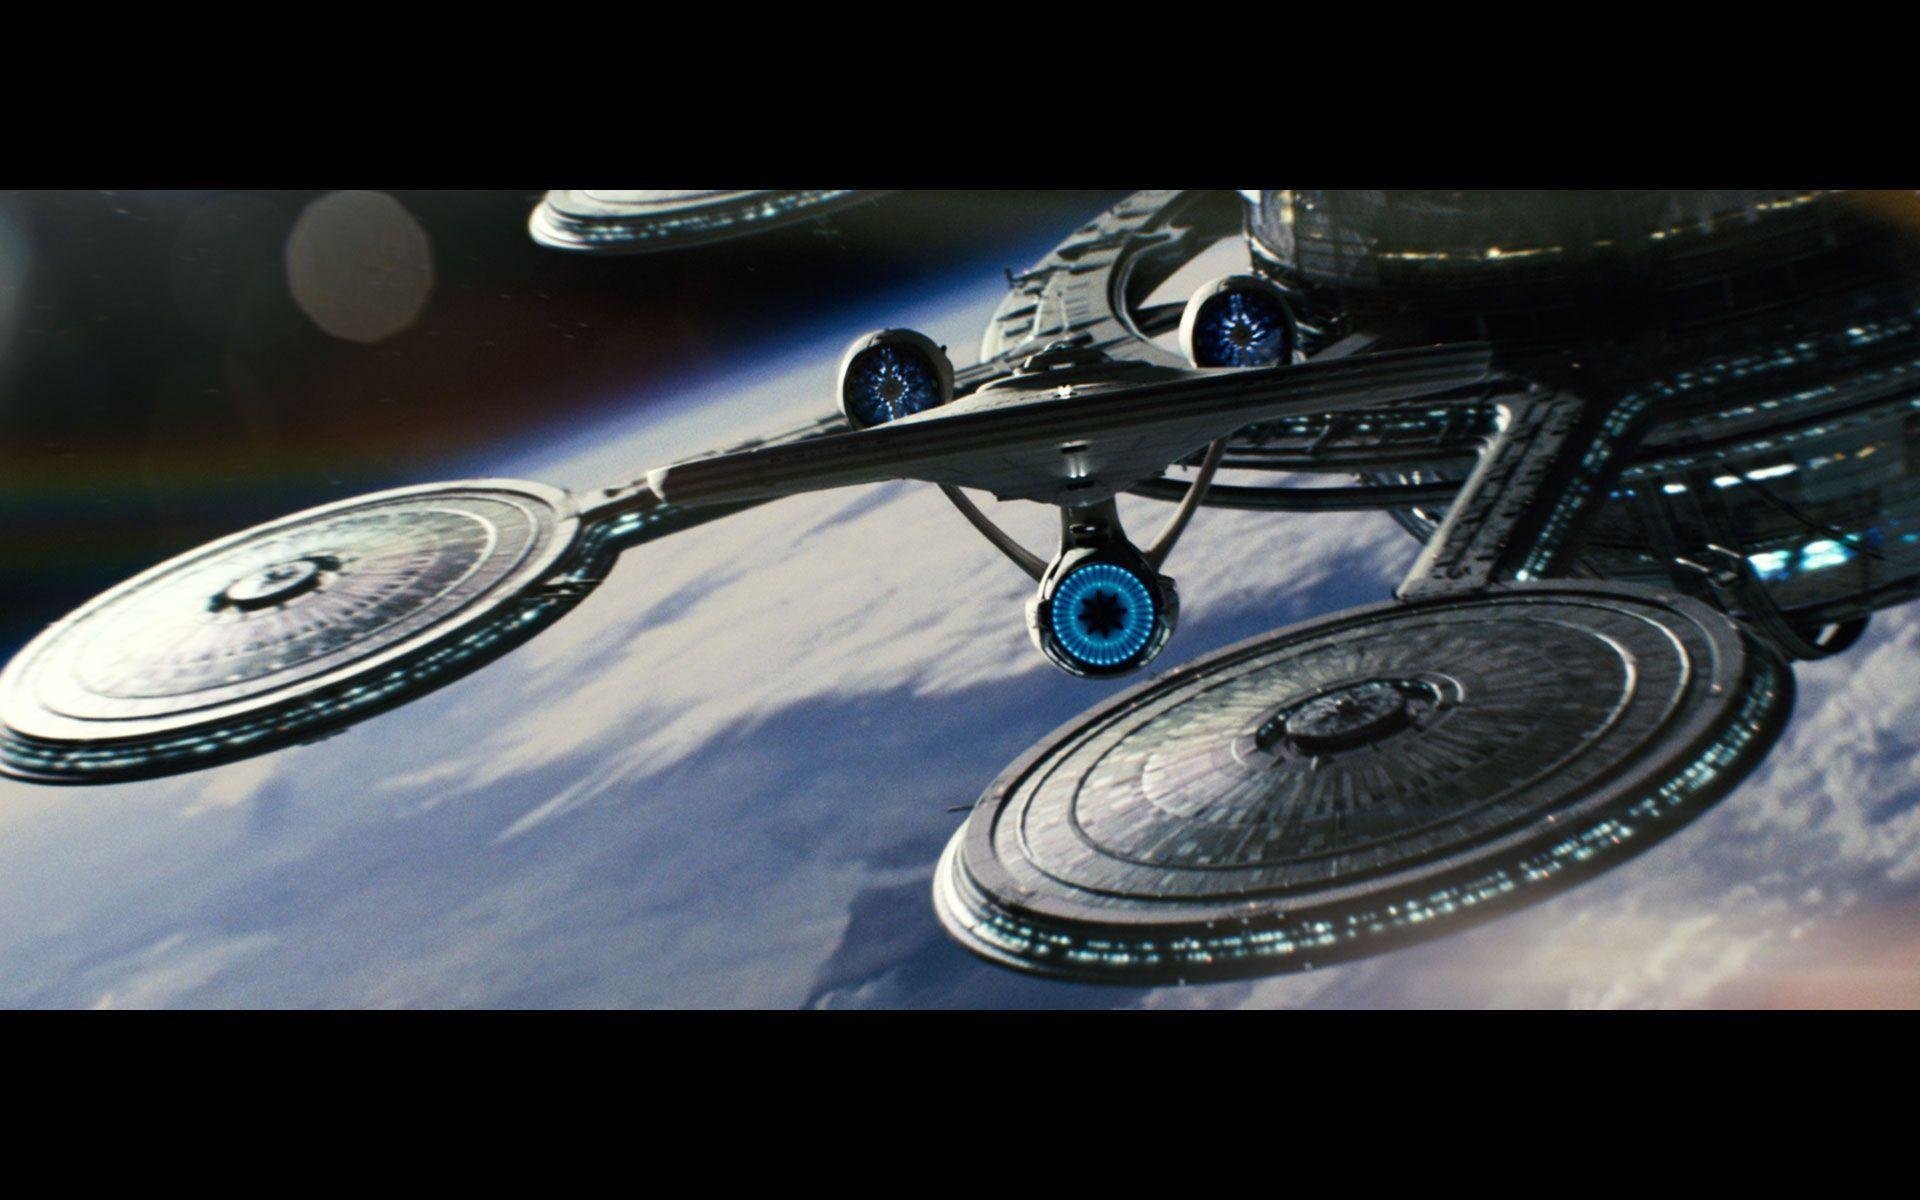 Star Trek Enterprise Wallpapers – Full HD wallpaper search – page 2